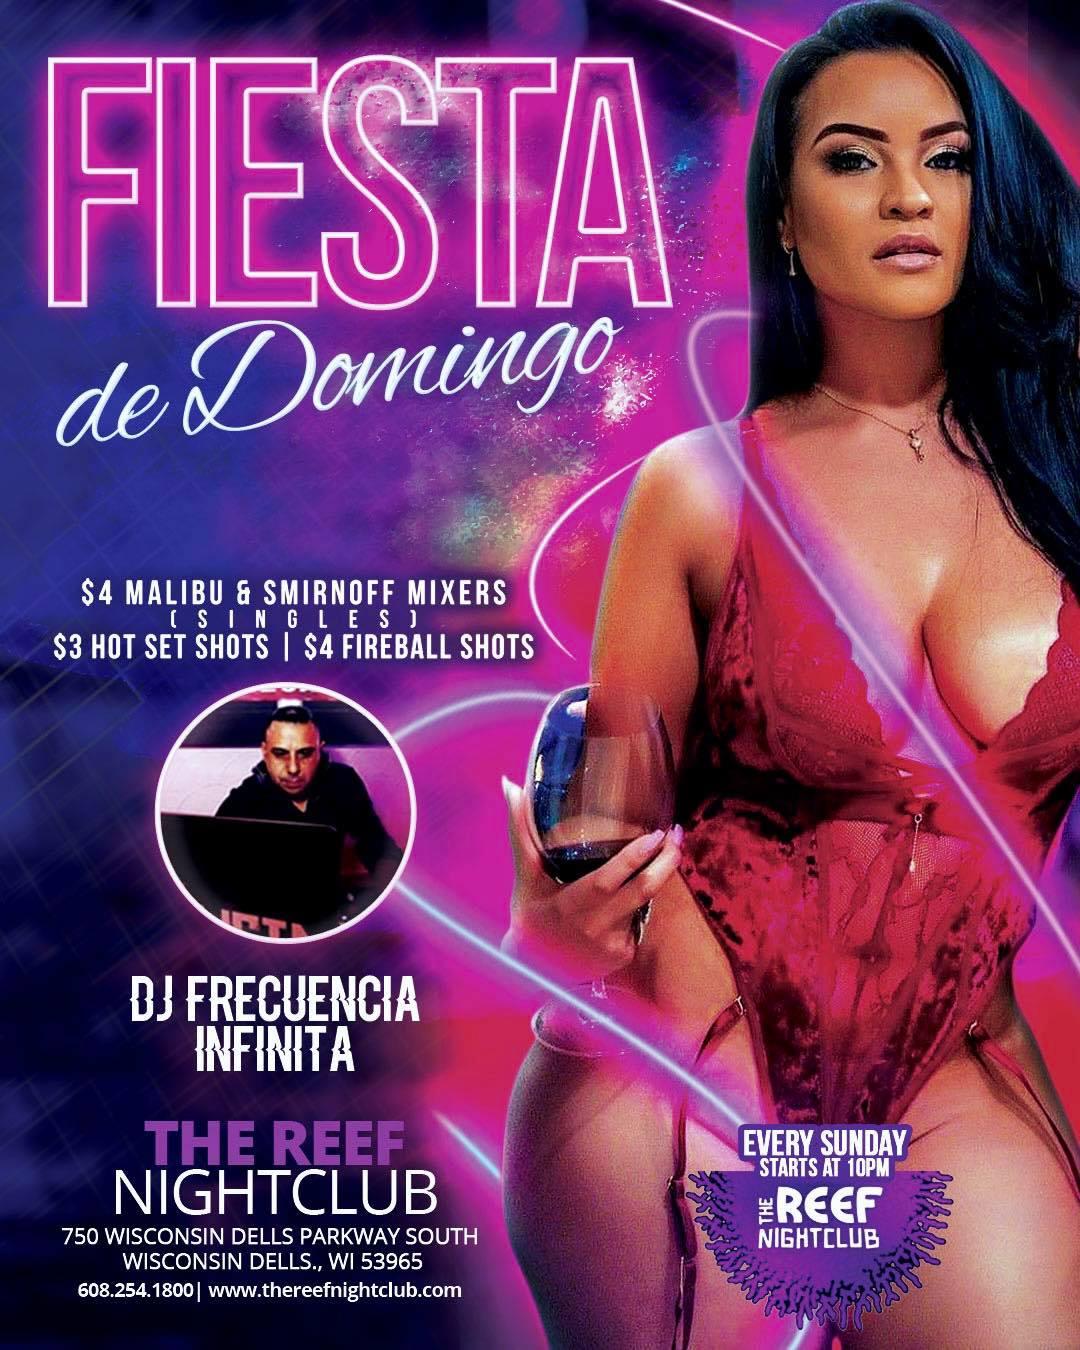 The Reef Night Club Sunday Latin Nights